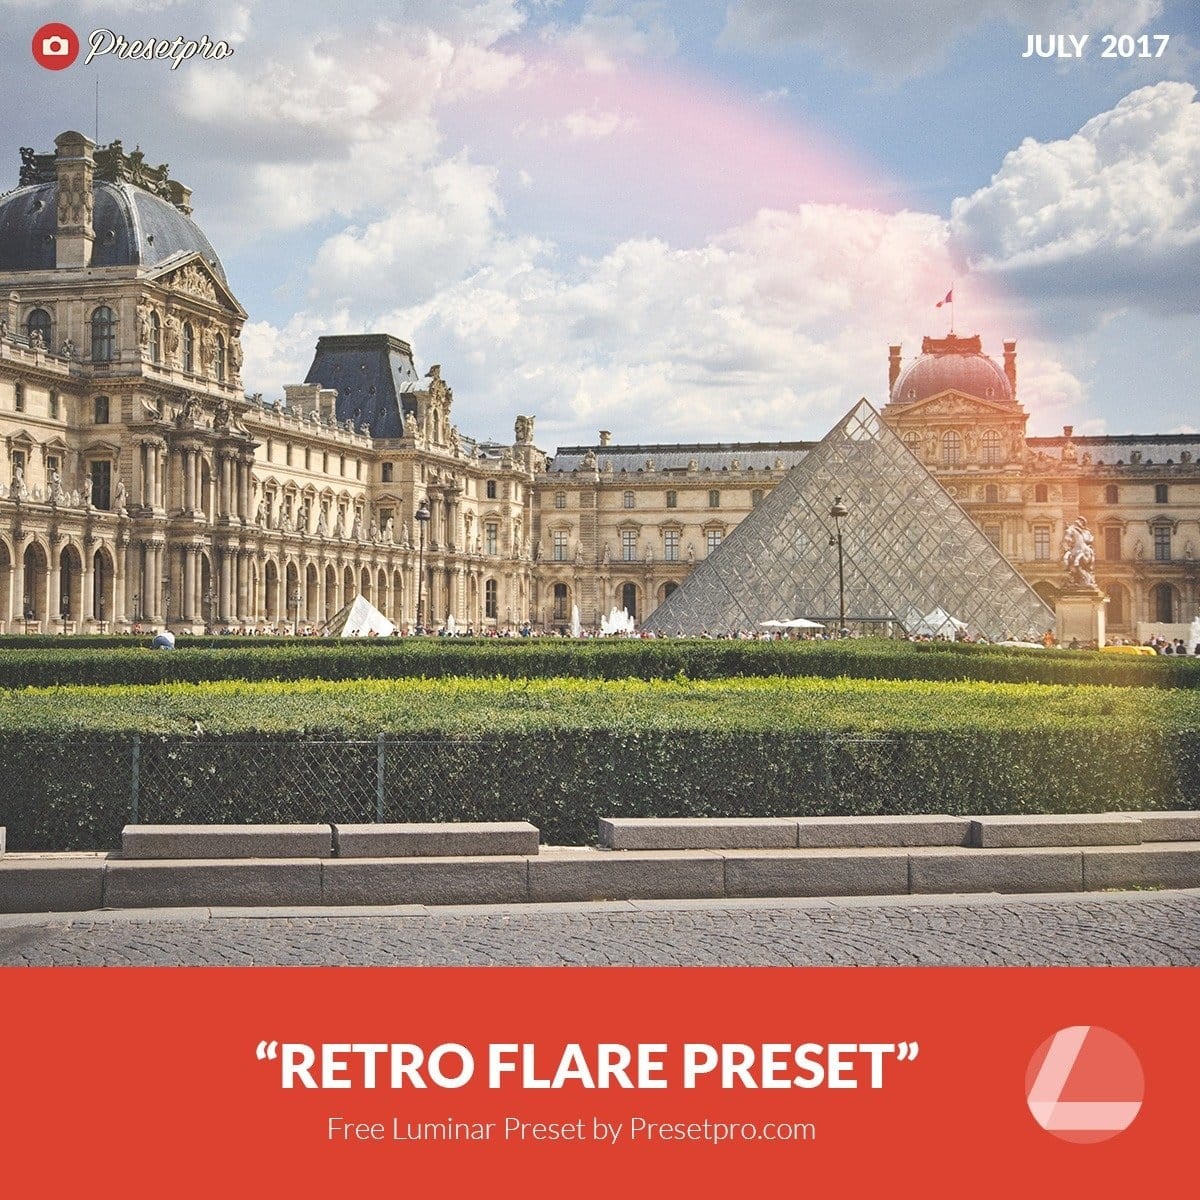 Free-Luminar-Preset-Retro-Flare-Presetpro.com